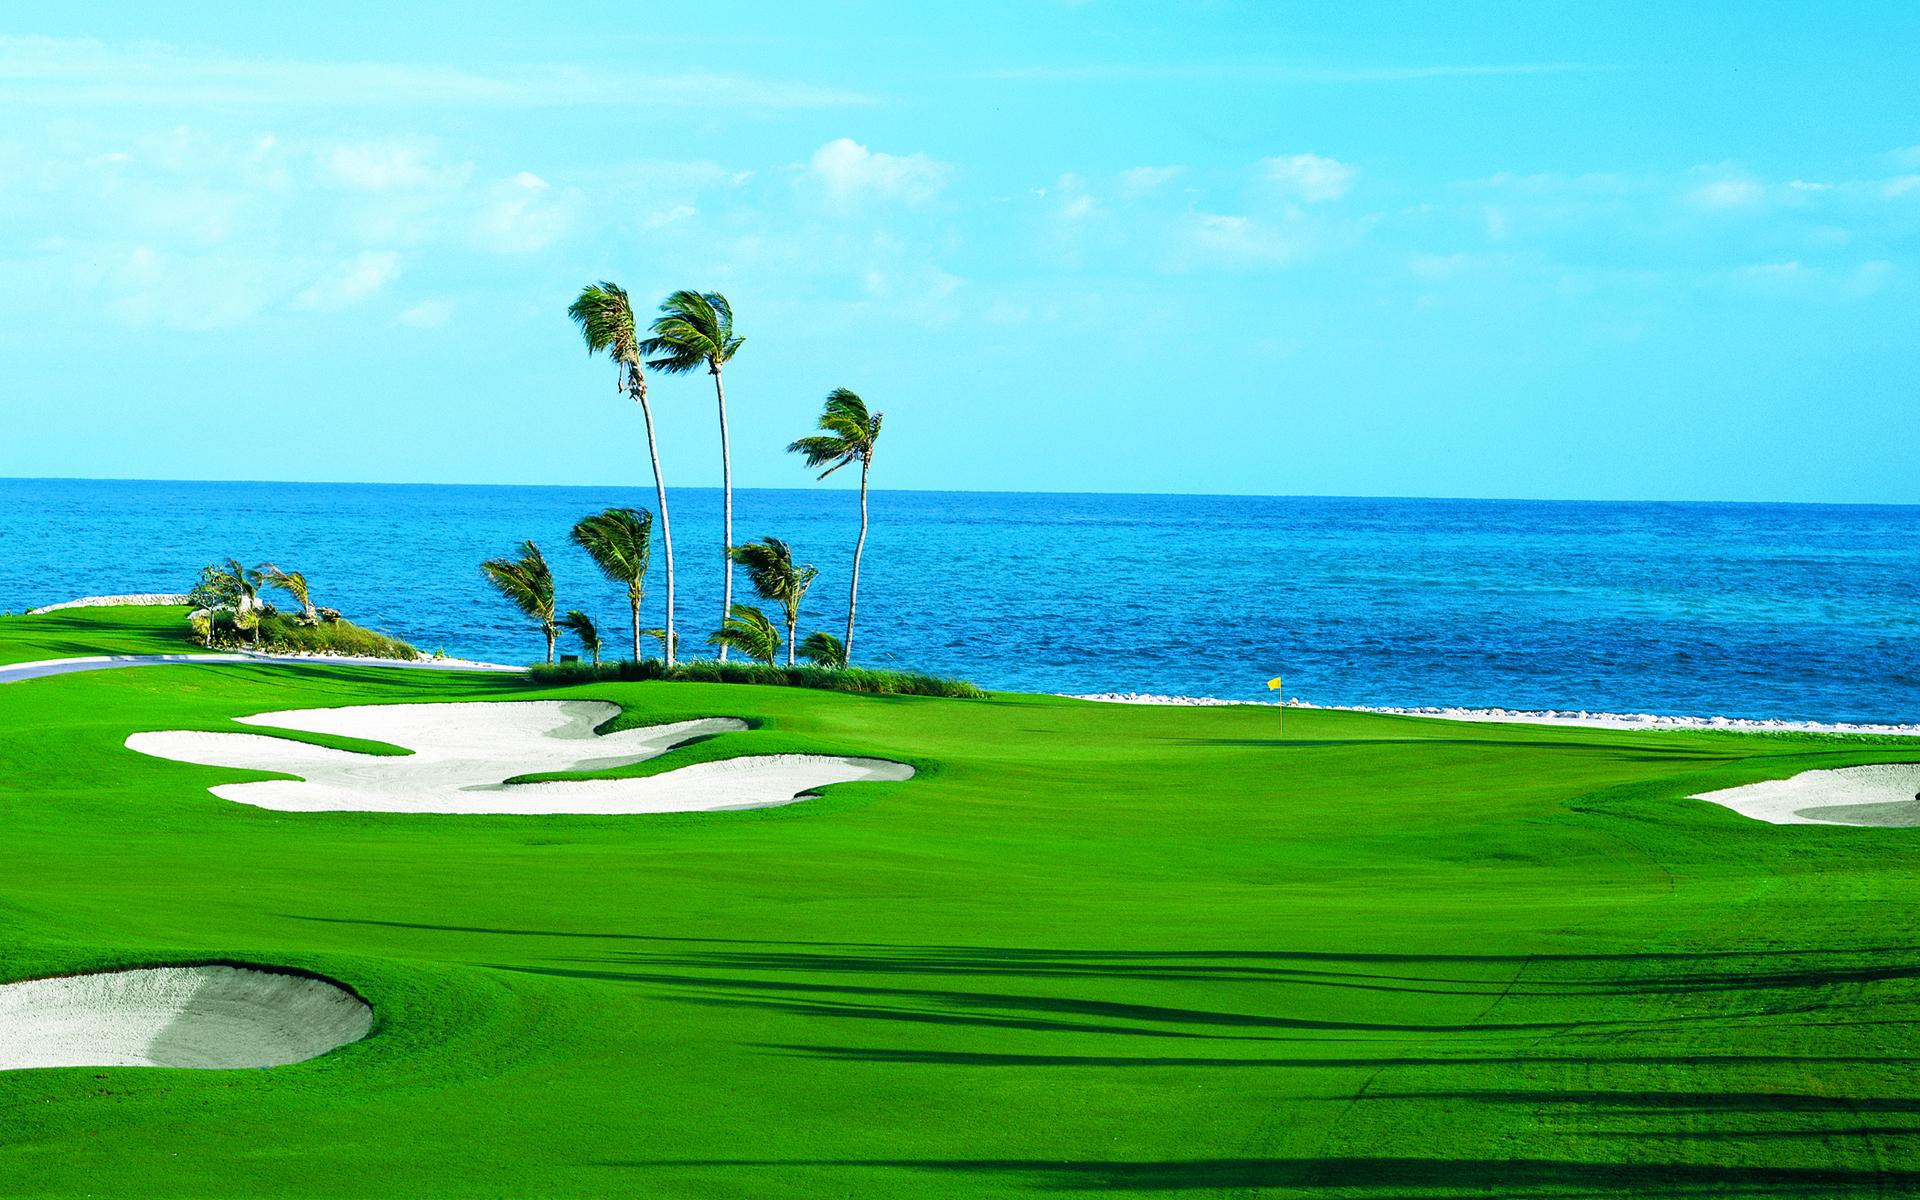 Desktop Backgrounds Golf Courses wallpapers HD   386688 1920x1200